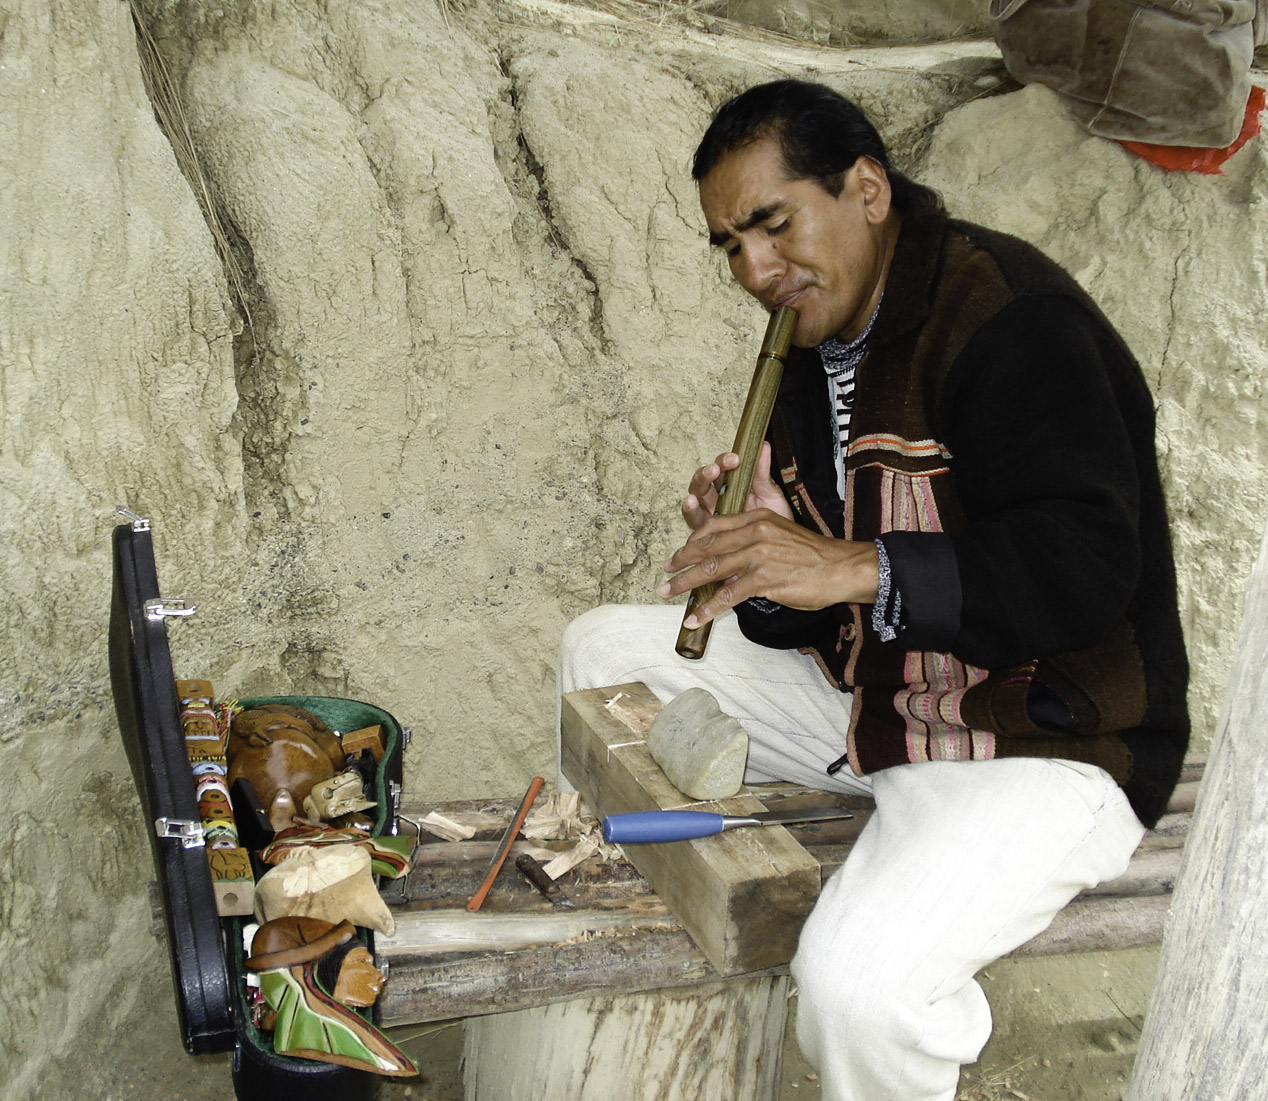 Instrument craftsman in Peru playing wooden flute